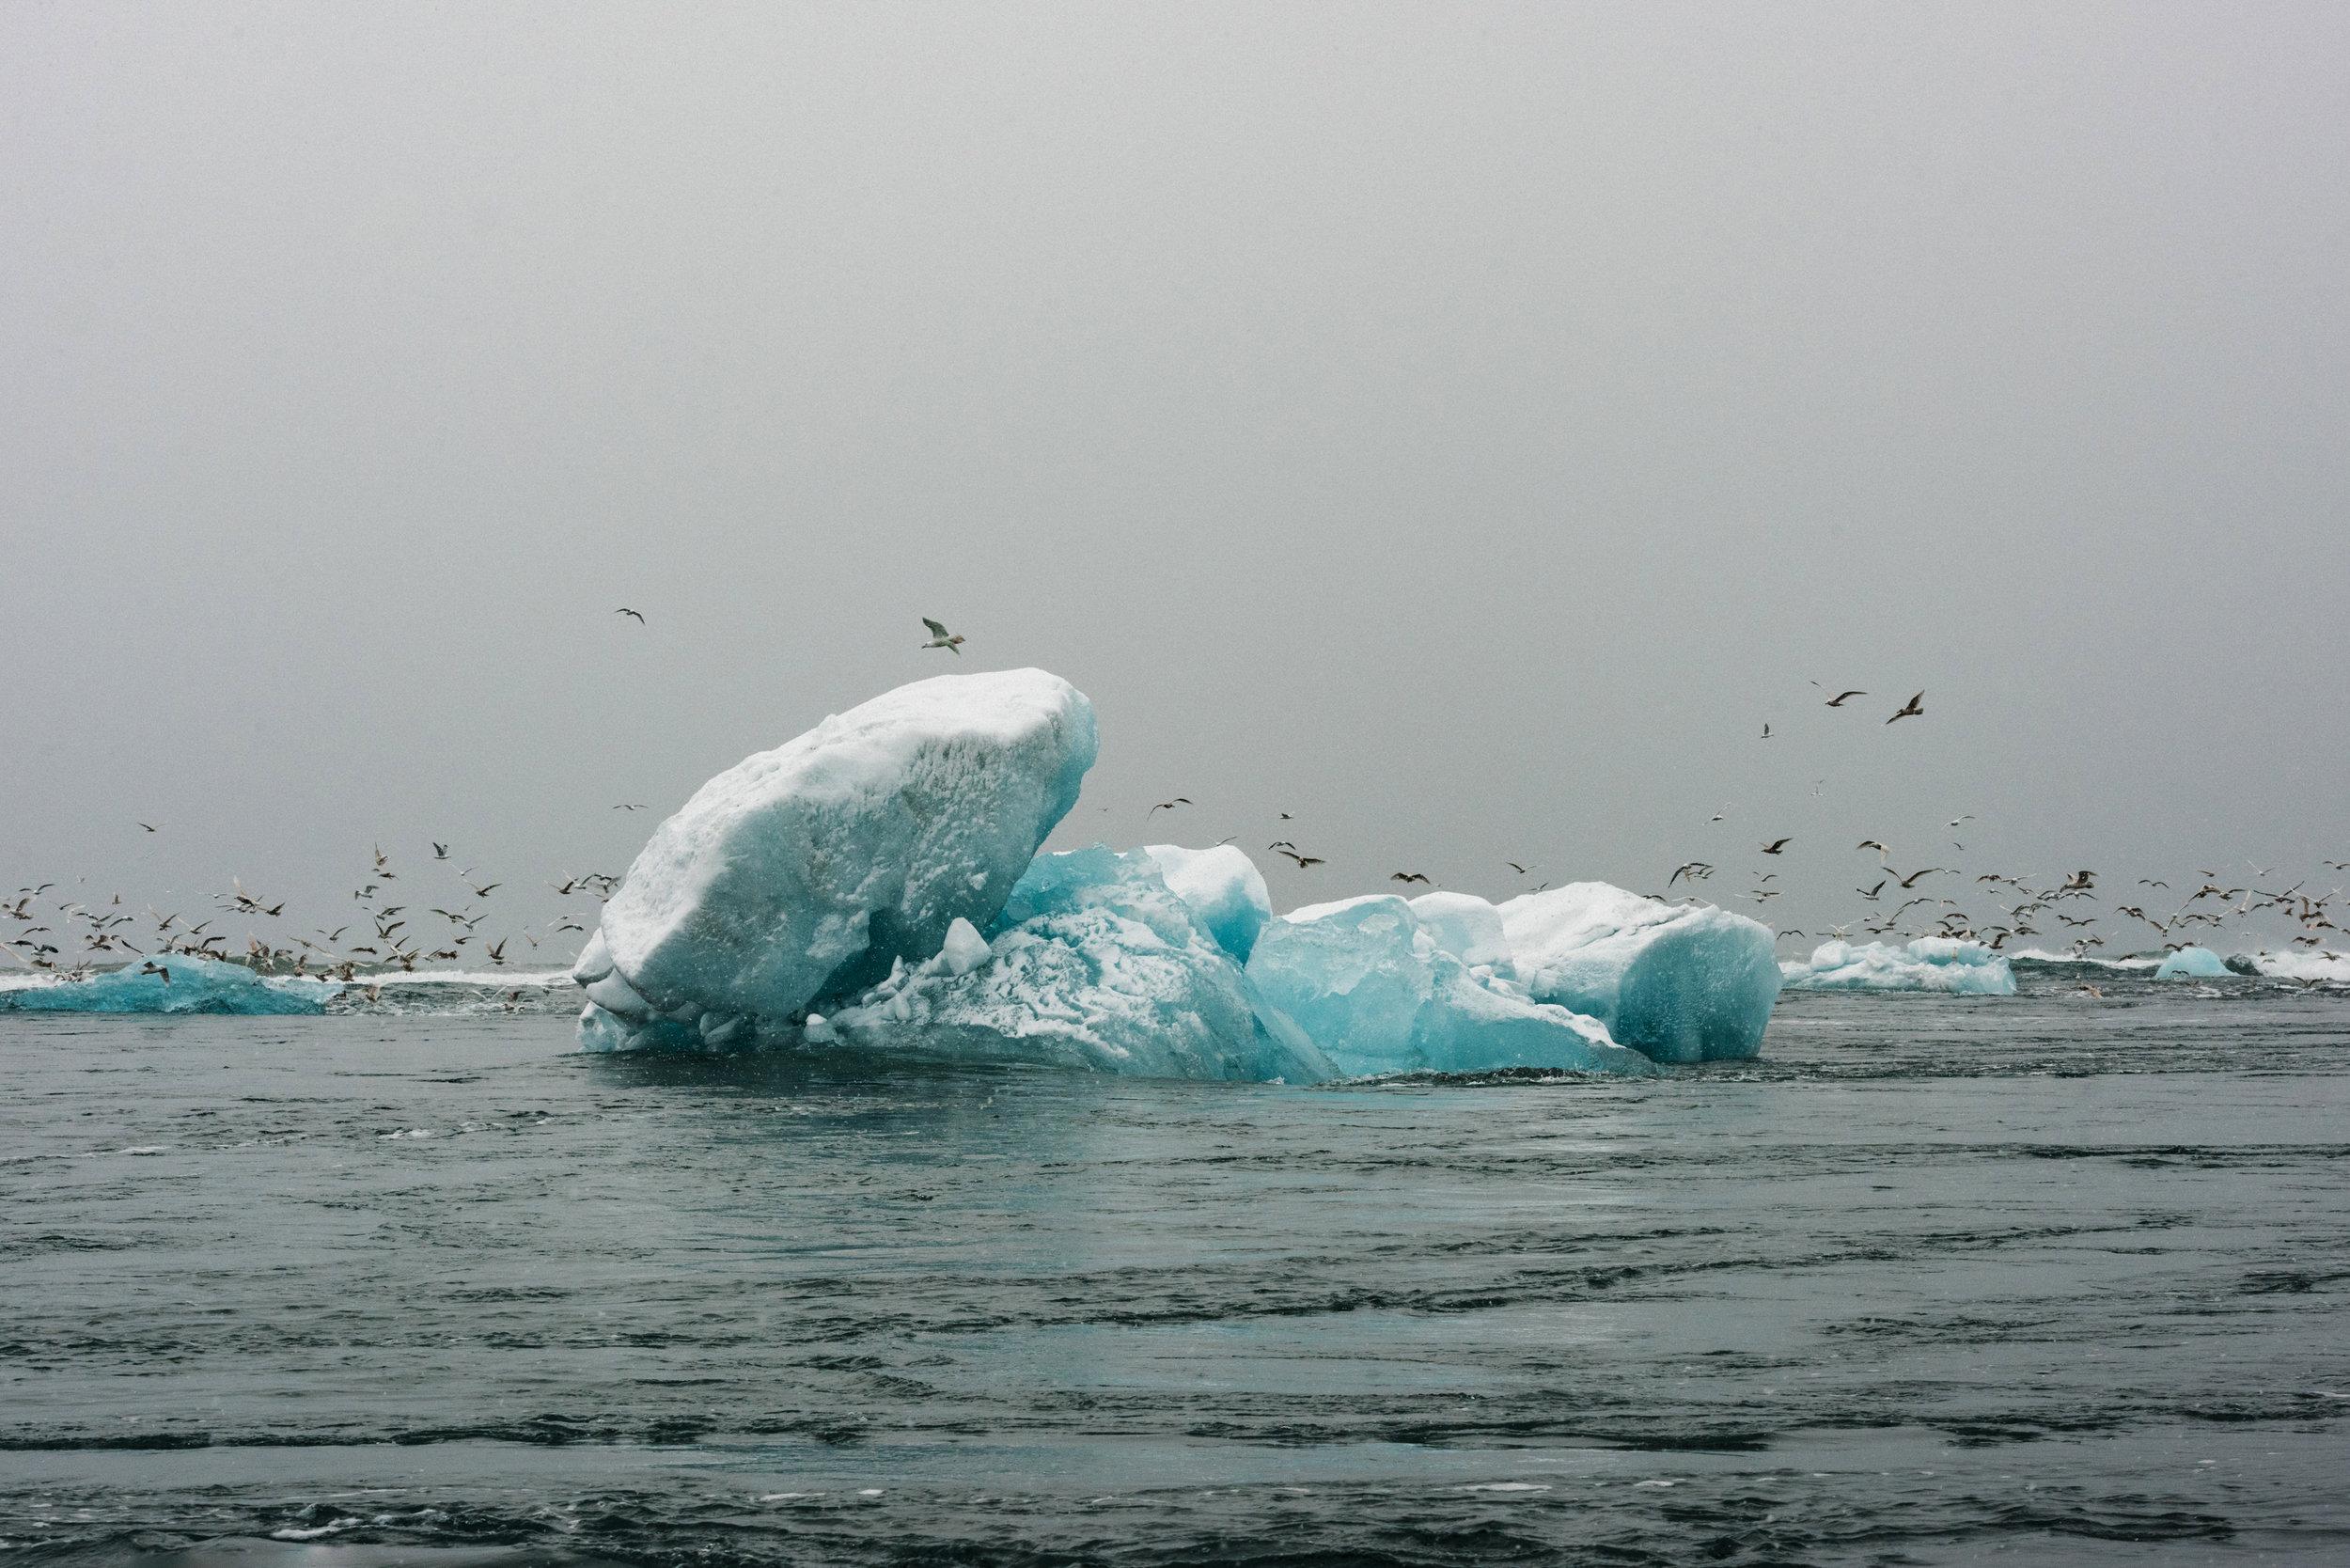 ICELAND_WOMAN_PHOTOGRAPHER_TARASHUPE_OUTDOOR_PHOTOGRAPHY_099.jpg